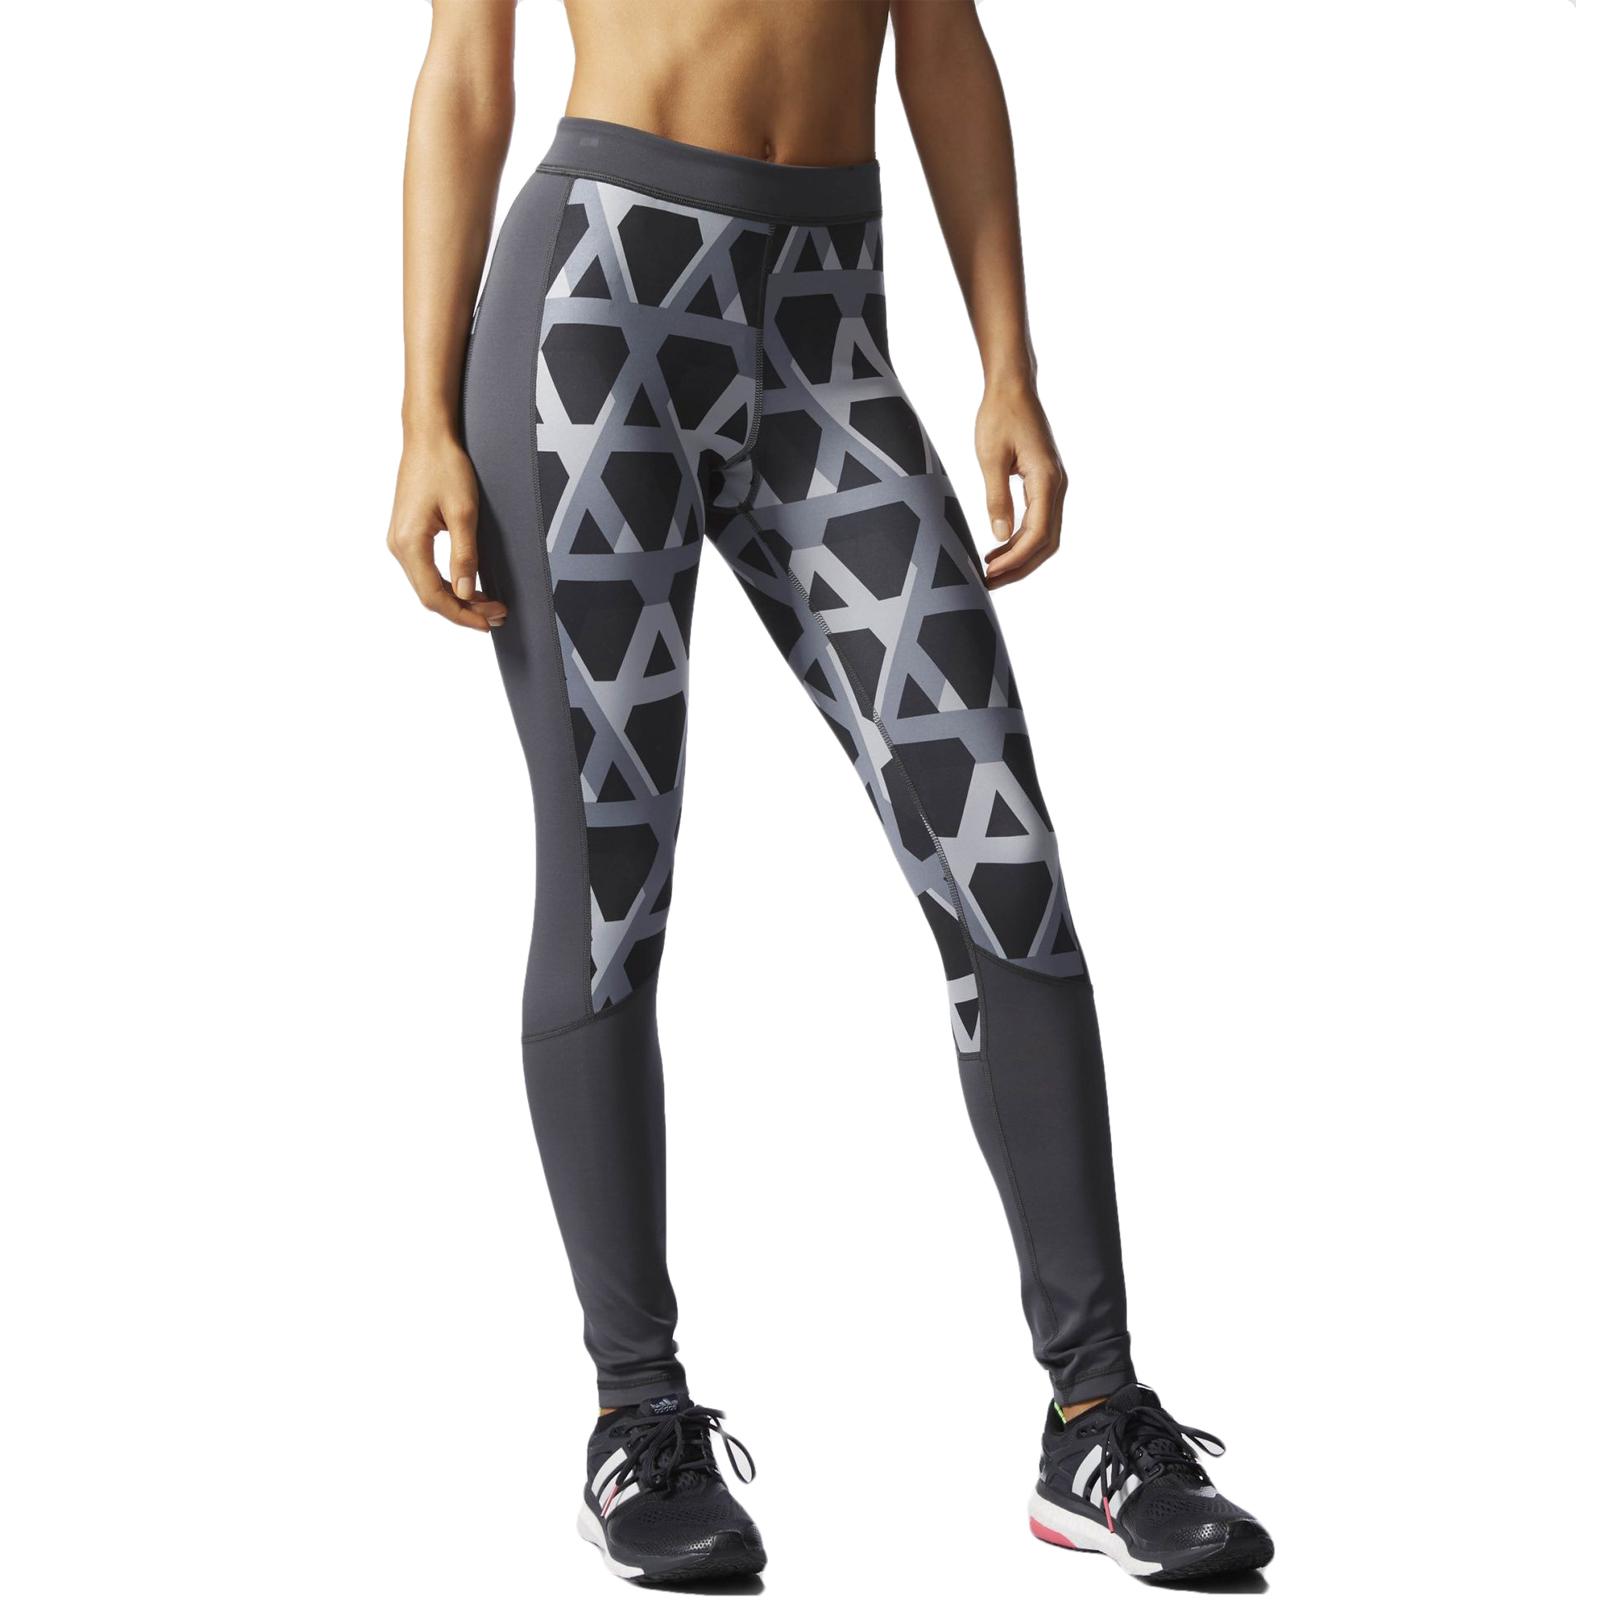 Popular Adidas  Women39s Workout Pants  Women  Clothing  Pants Amp Tights